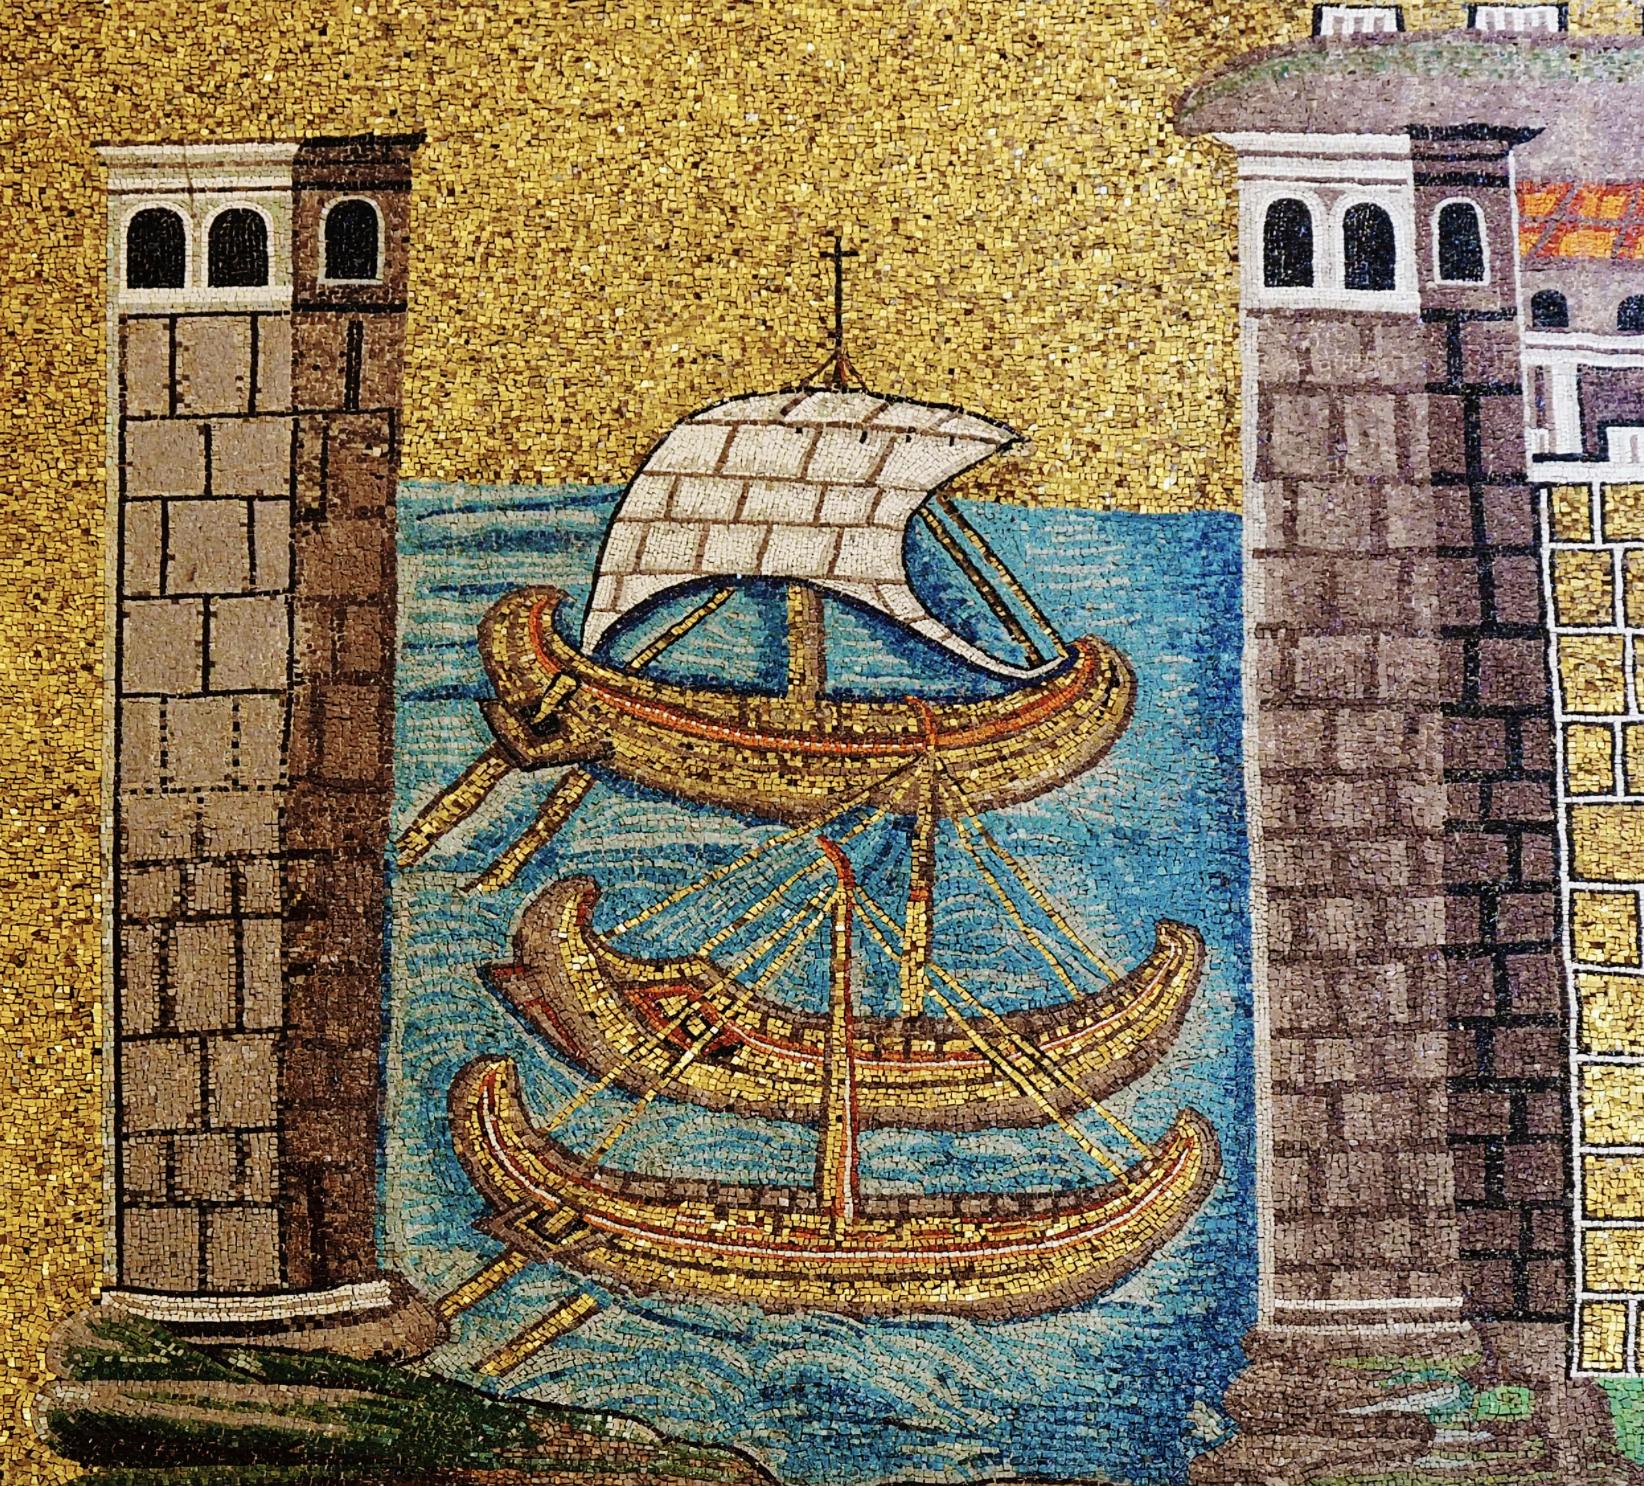 Classe The Ancient Port Of Ravenna Basilica Sant Apollinare Nuovo Thi 504 Ce Wall Mosaic I Original To Arian Palace Churc Art Byzantine Roman Sailing Byzantium Paraphrase